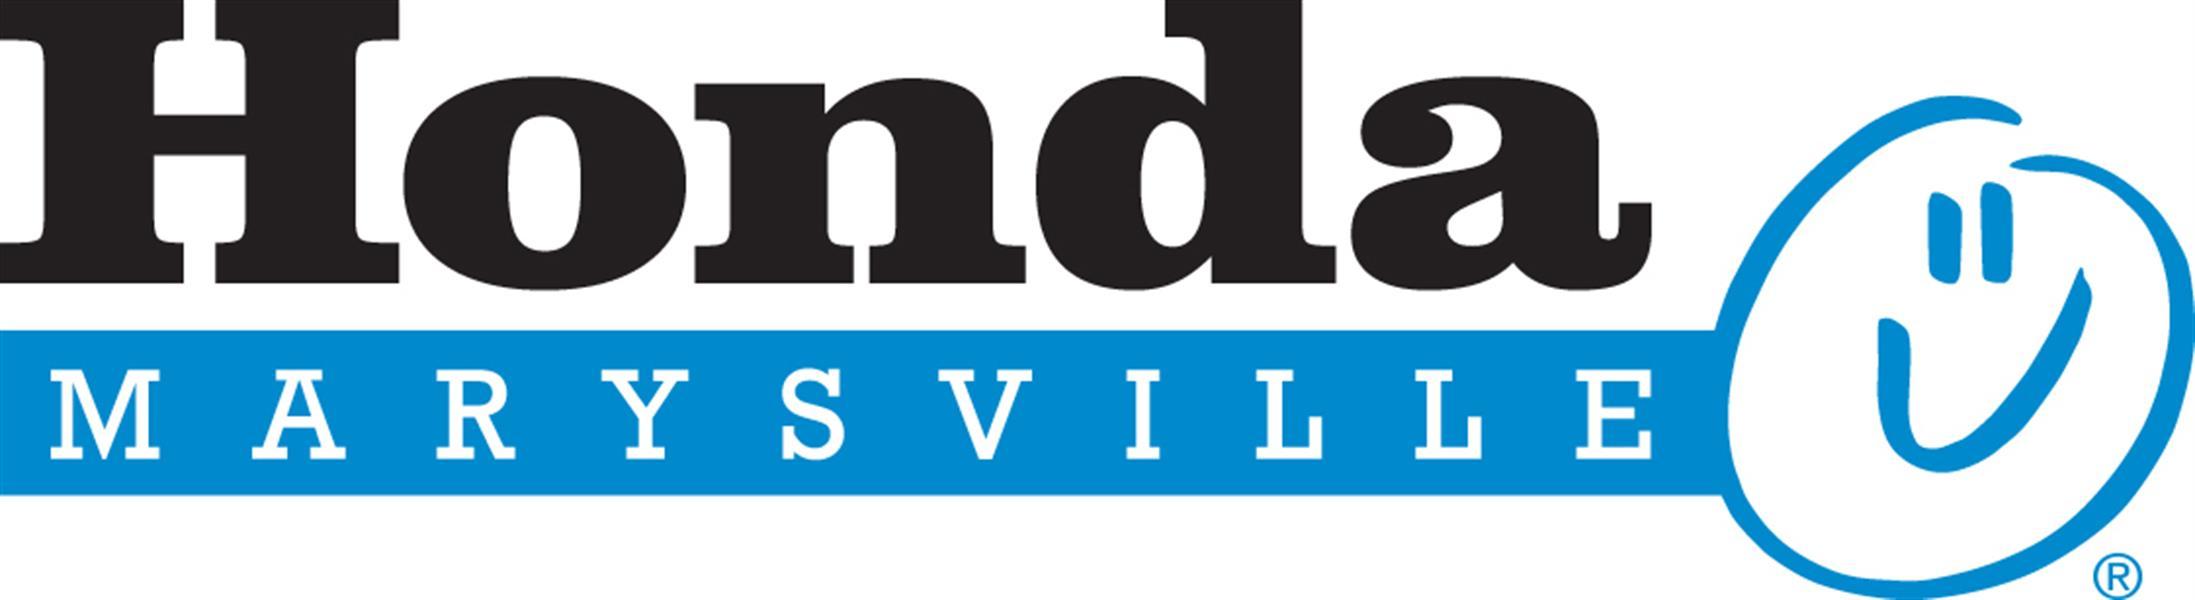 Honda Marysville & Honda Motorsports